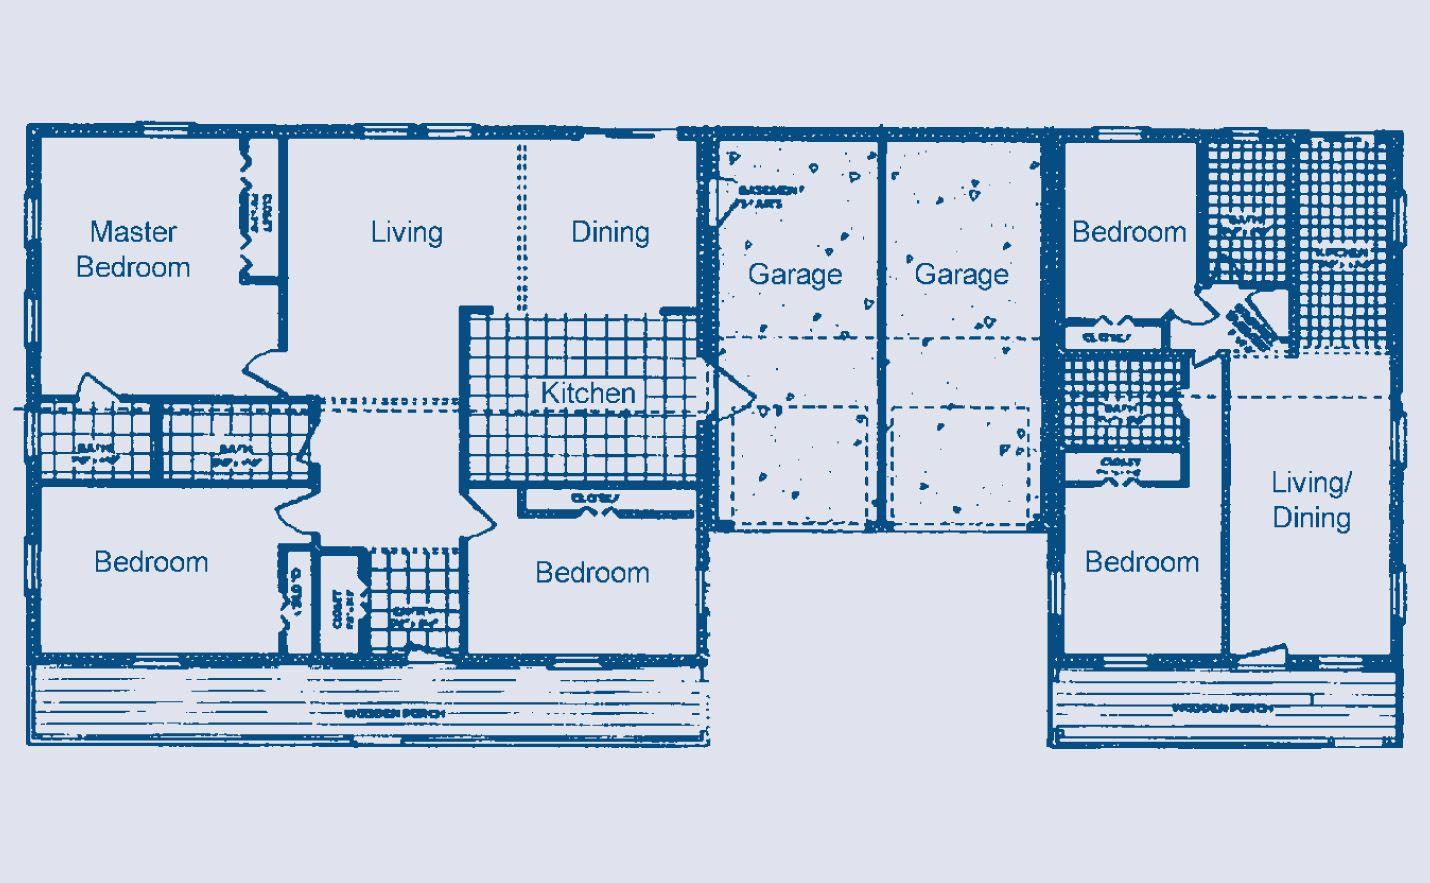 images about Floor Plan Duplex on Pinterest   Duplex Plans       images about Floor Plan Duplex on Pinterest   Duplex Plans  Duplex Floor Plans and Floor Plans